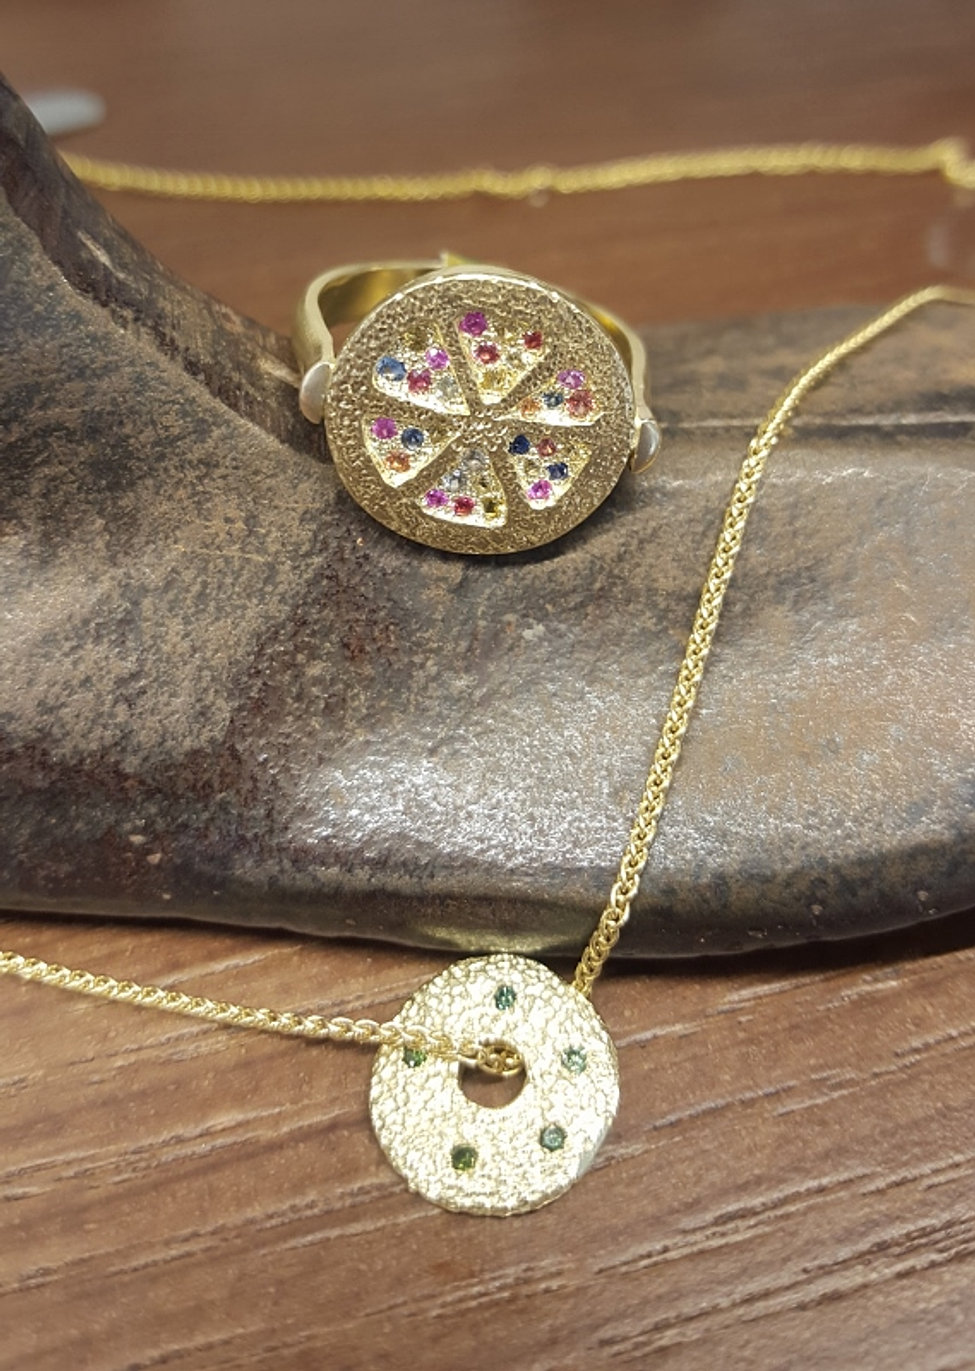 Anna Anat Jewelry Design Tel Aviv goldsmith handmade jewelry